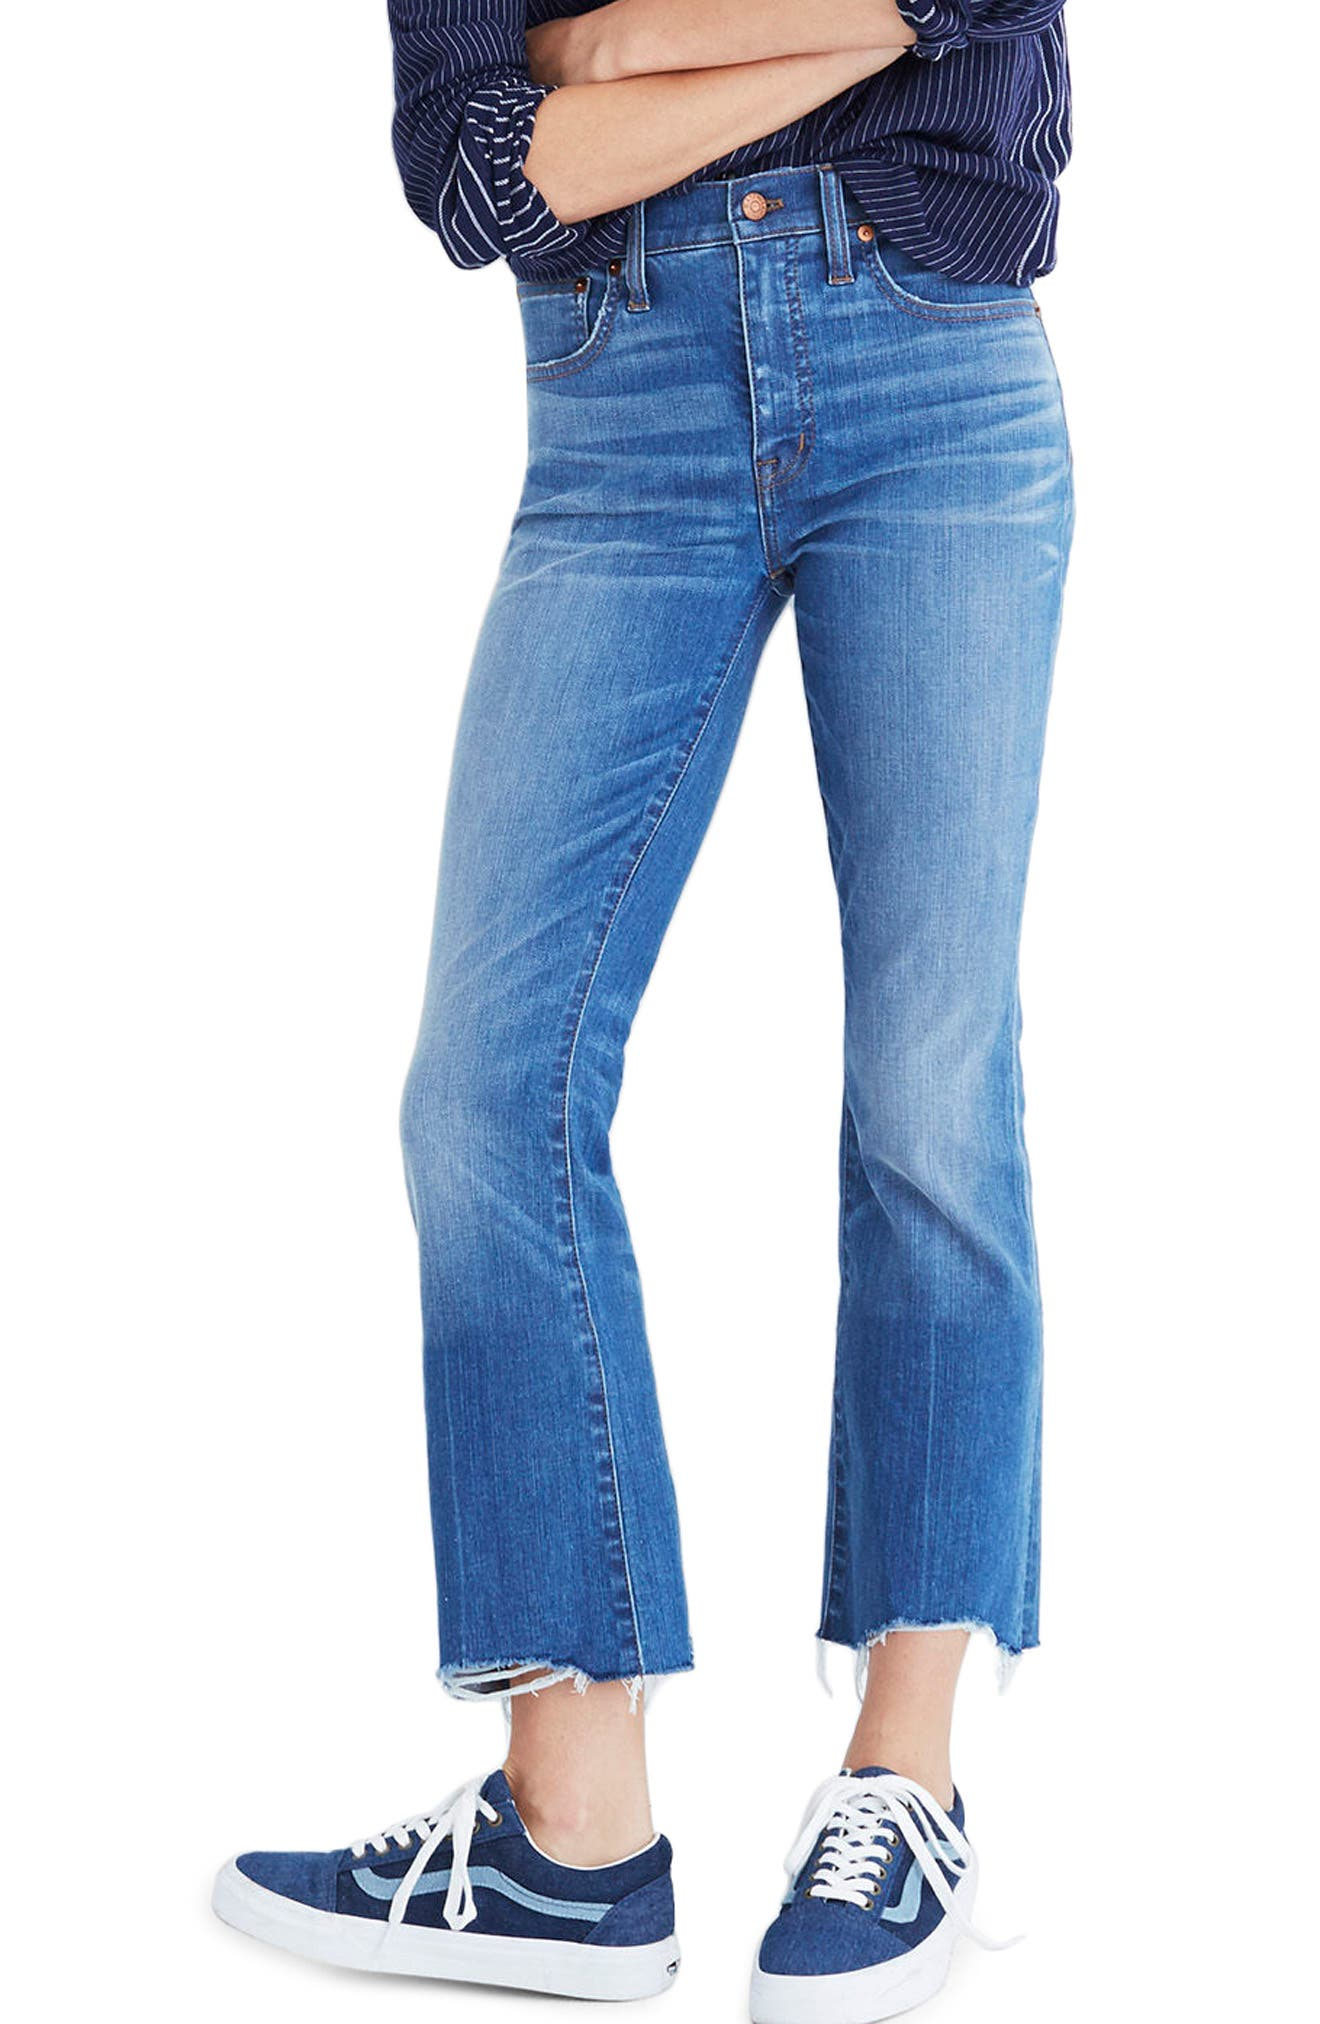 Cali Demi Boot Jeans,                             Main thumbnail 1, color,                             Haywood Wash